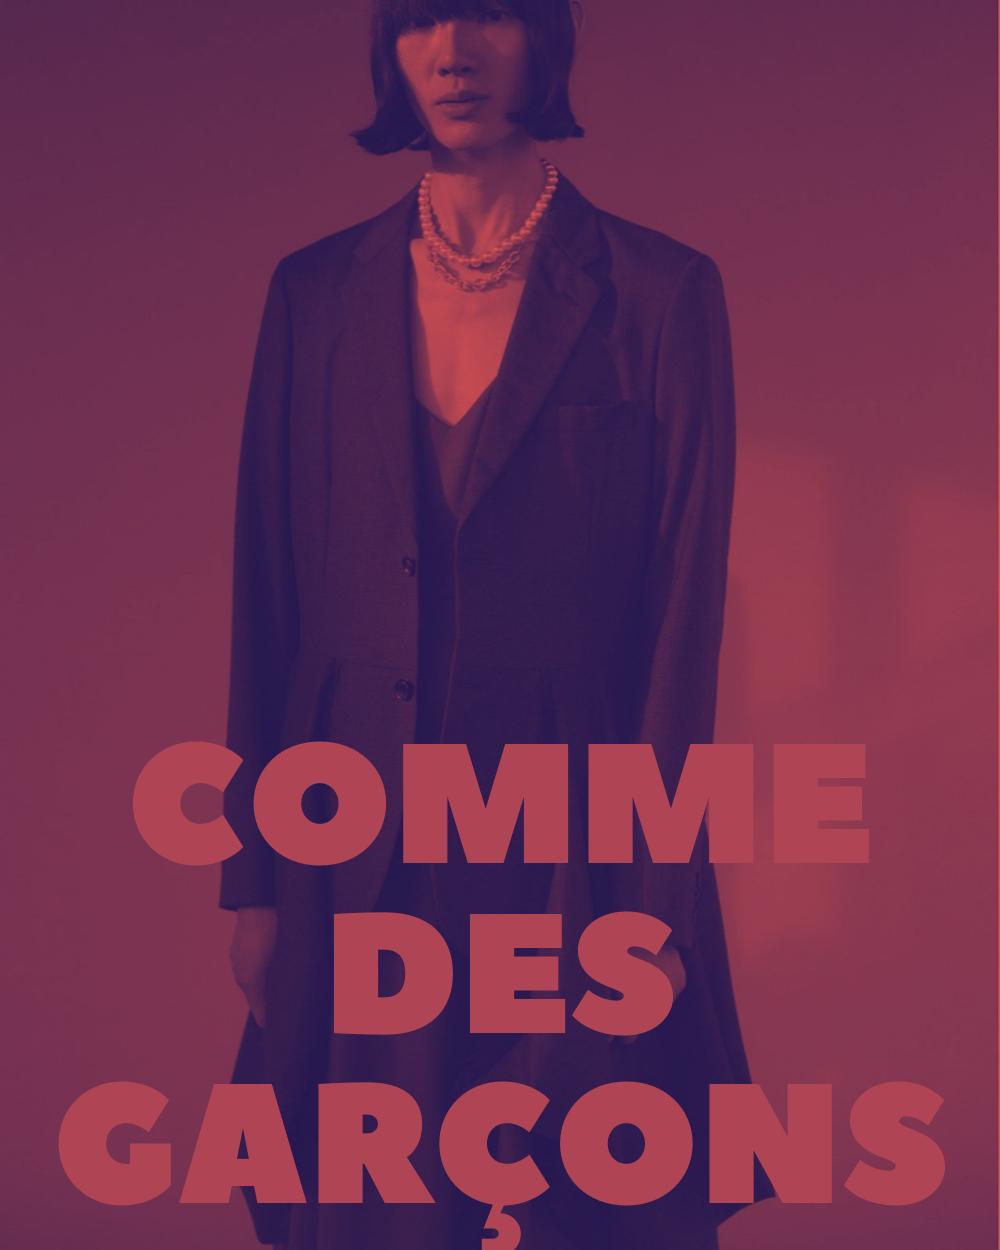 COMME DES GARÇONS Avant-garde modernism